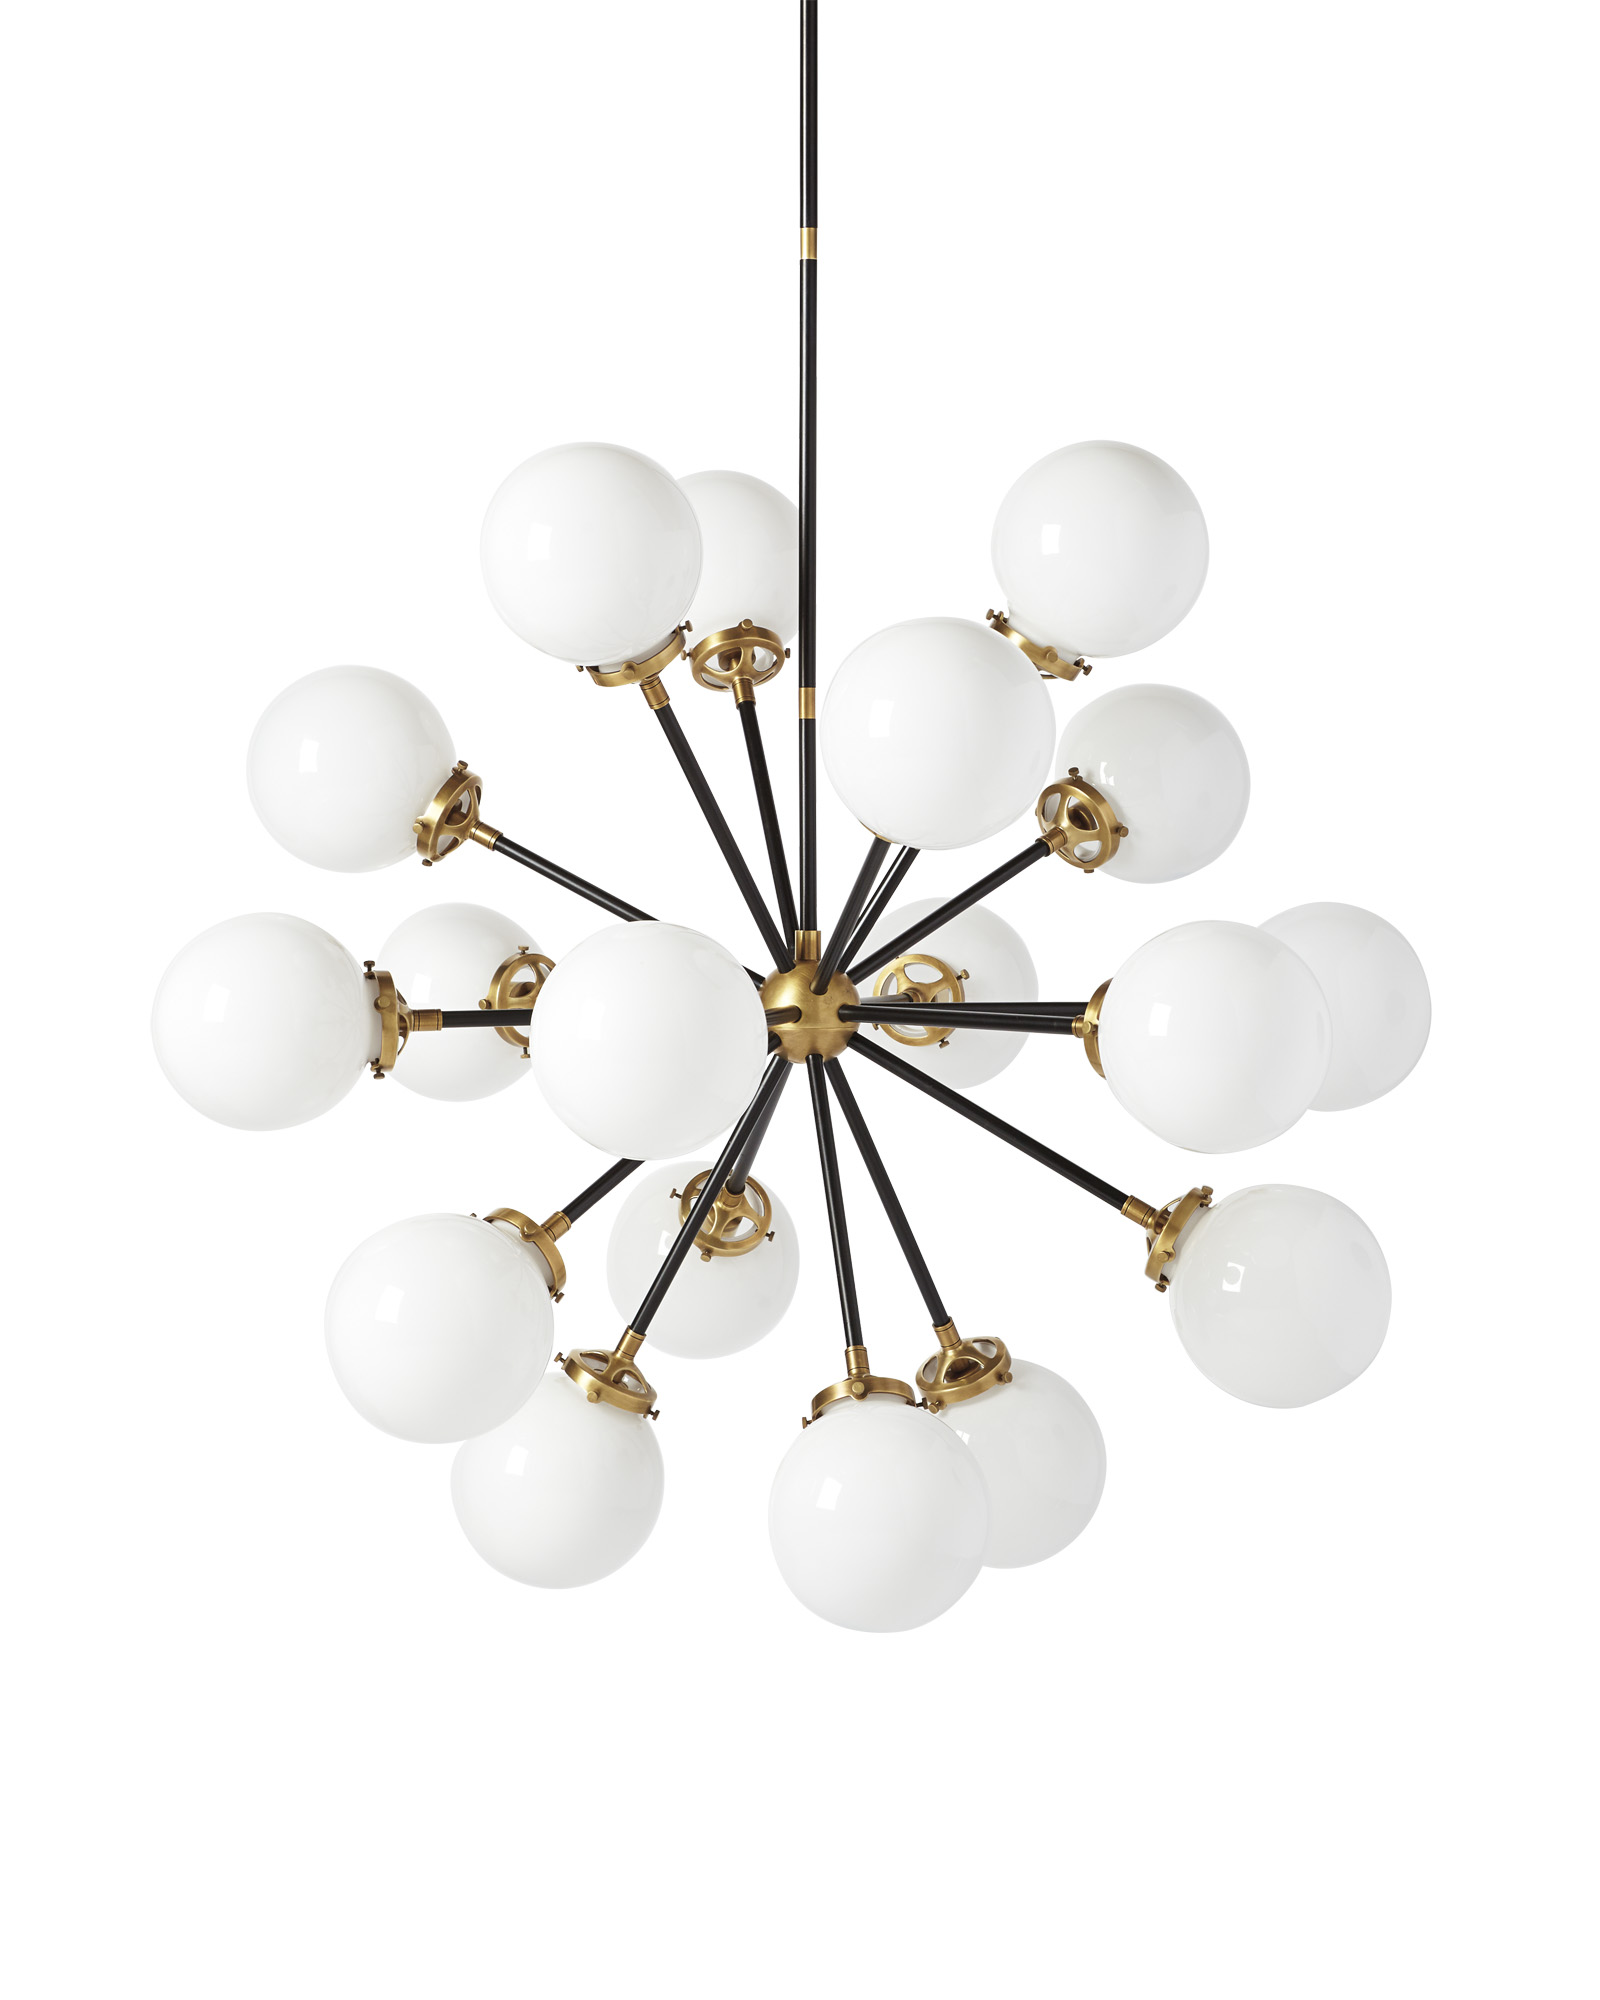 Lighting_chandelier1_MV_Crop_OL.jpg